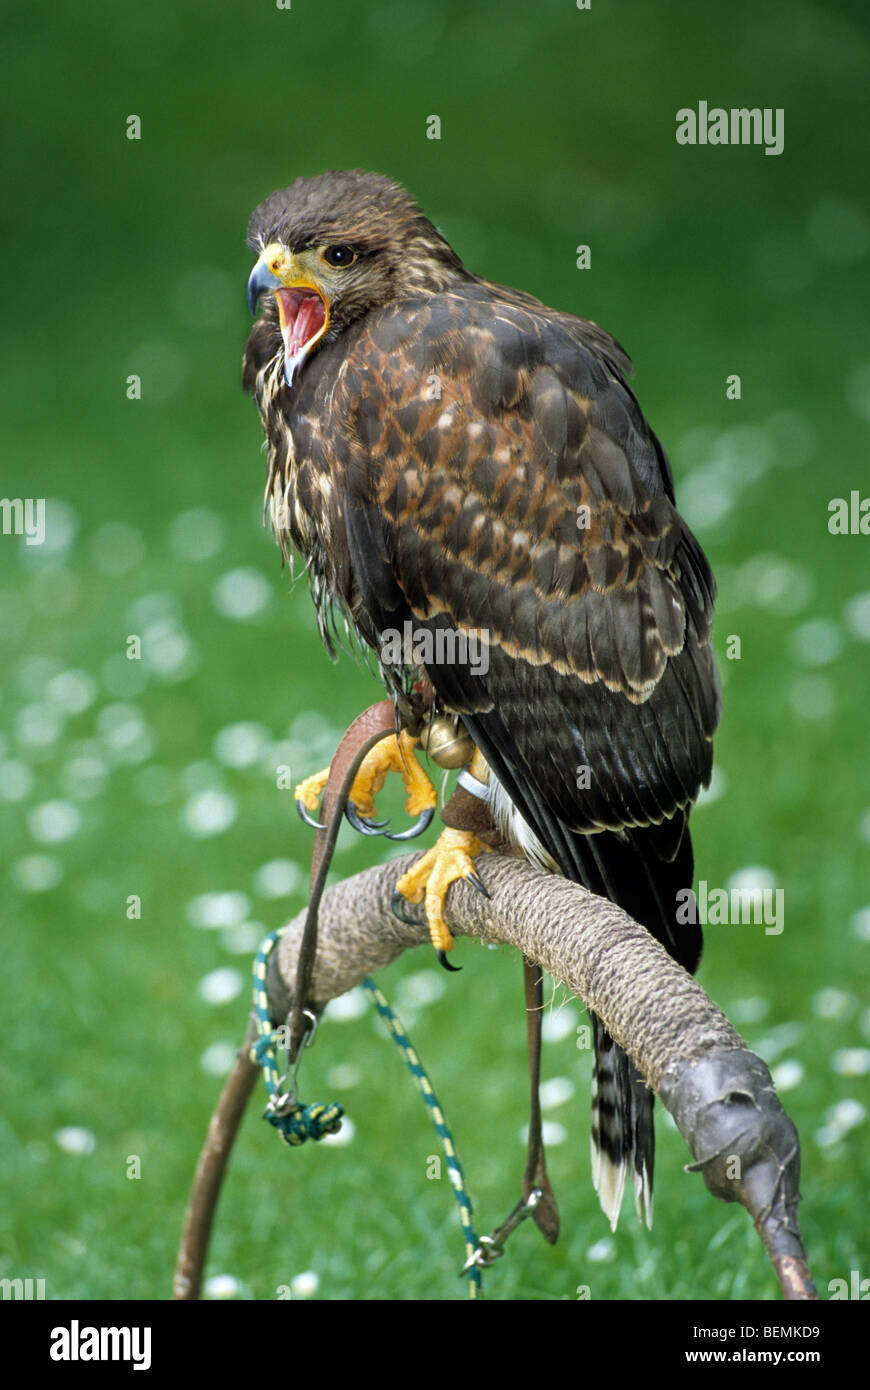 Harris's Hawk / Harris Hawk (Parabuteo unicinctus) perched at falconry - Stock Image